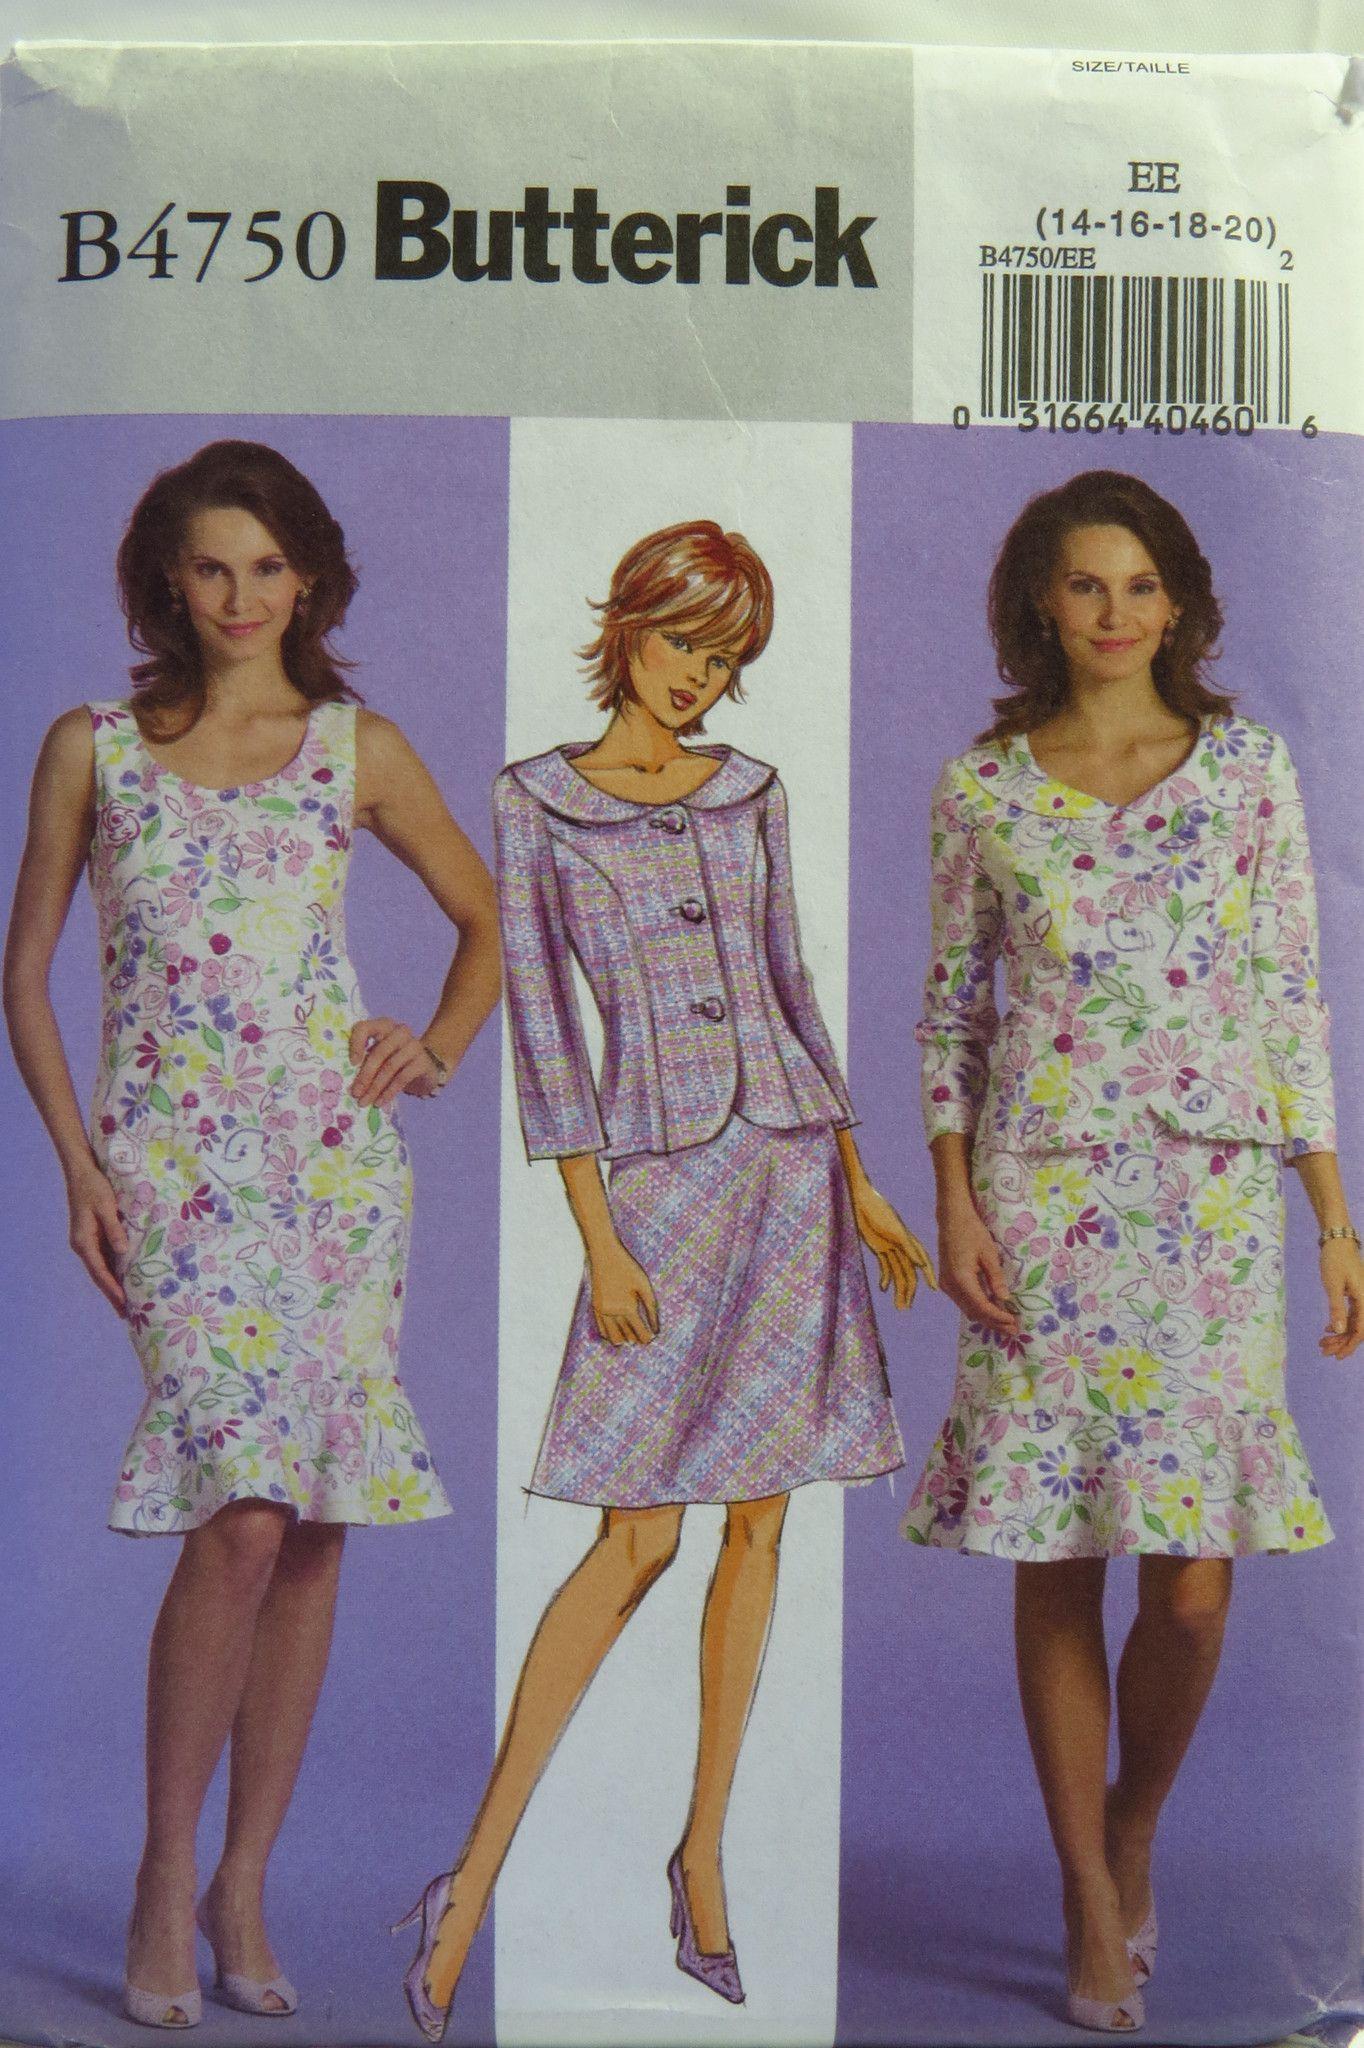 Butterick 4750 Misses'/Misses' Petite Jacket, Dress and Skirt